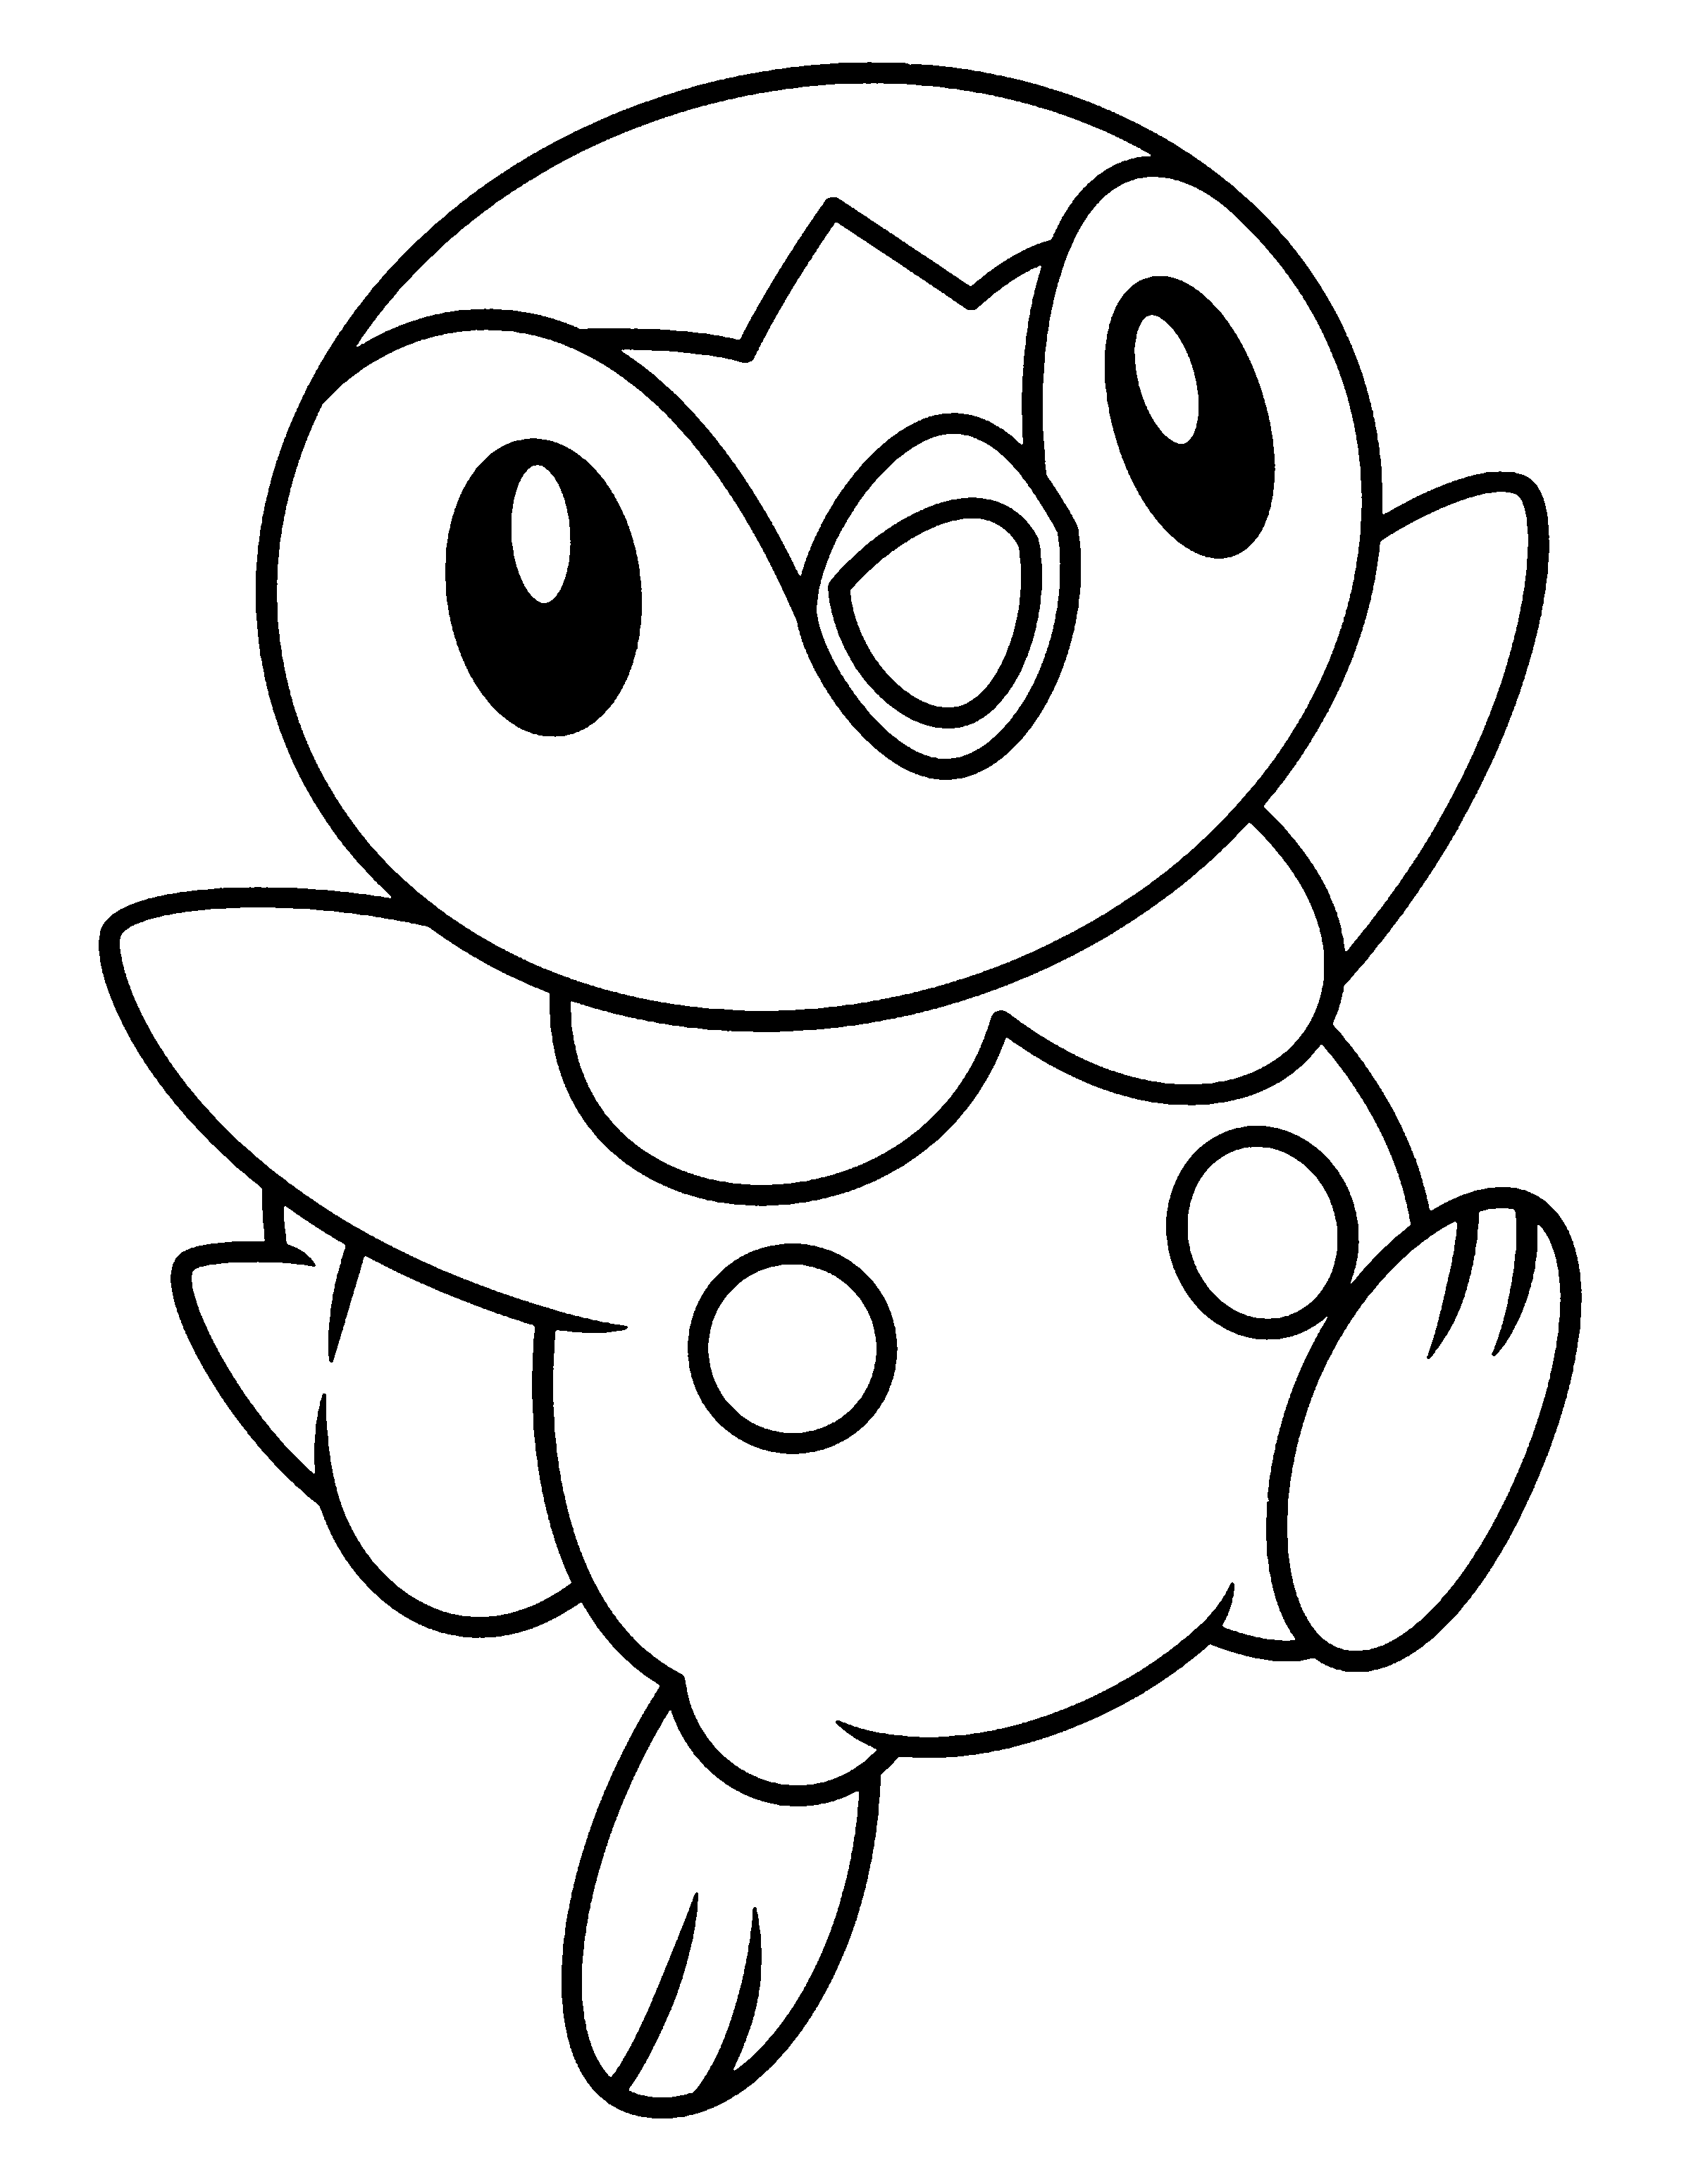 Pokemon Black And White Coloring Pages Pokemon Ausmalbilder Ausmalbilder Pokemon